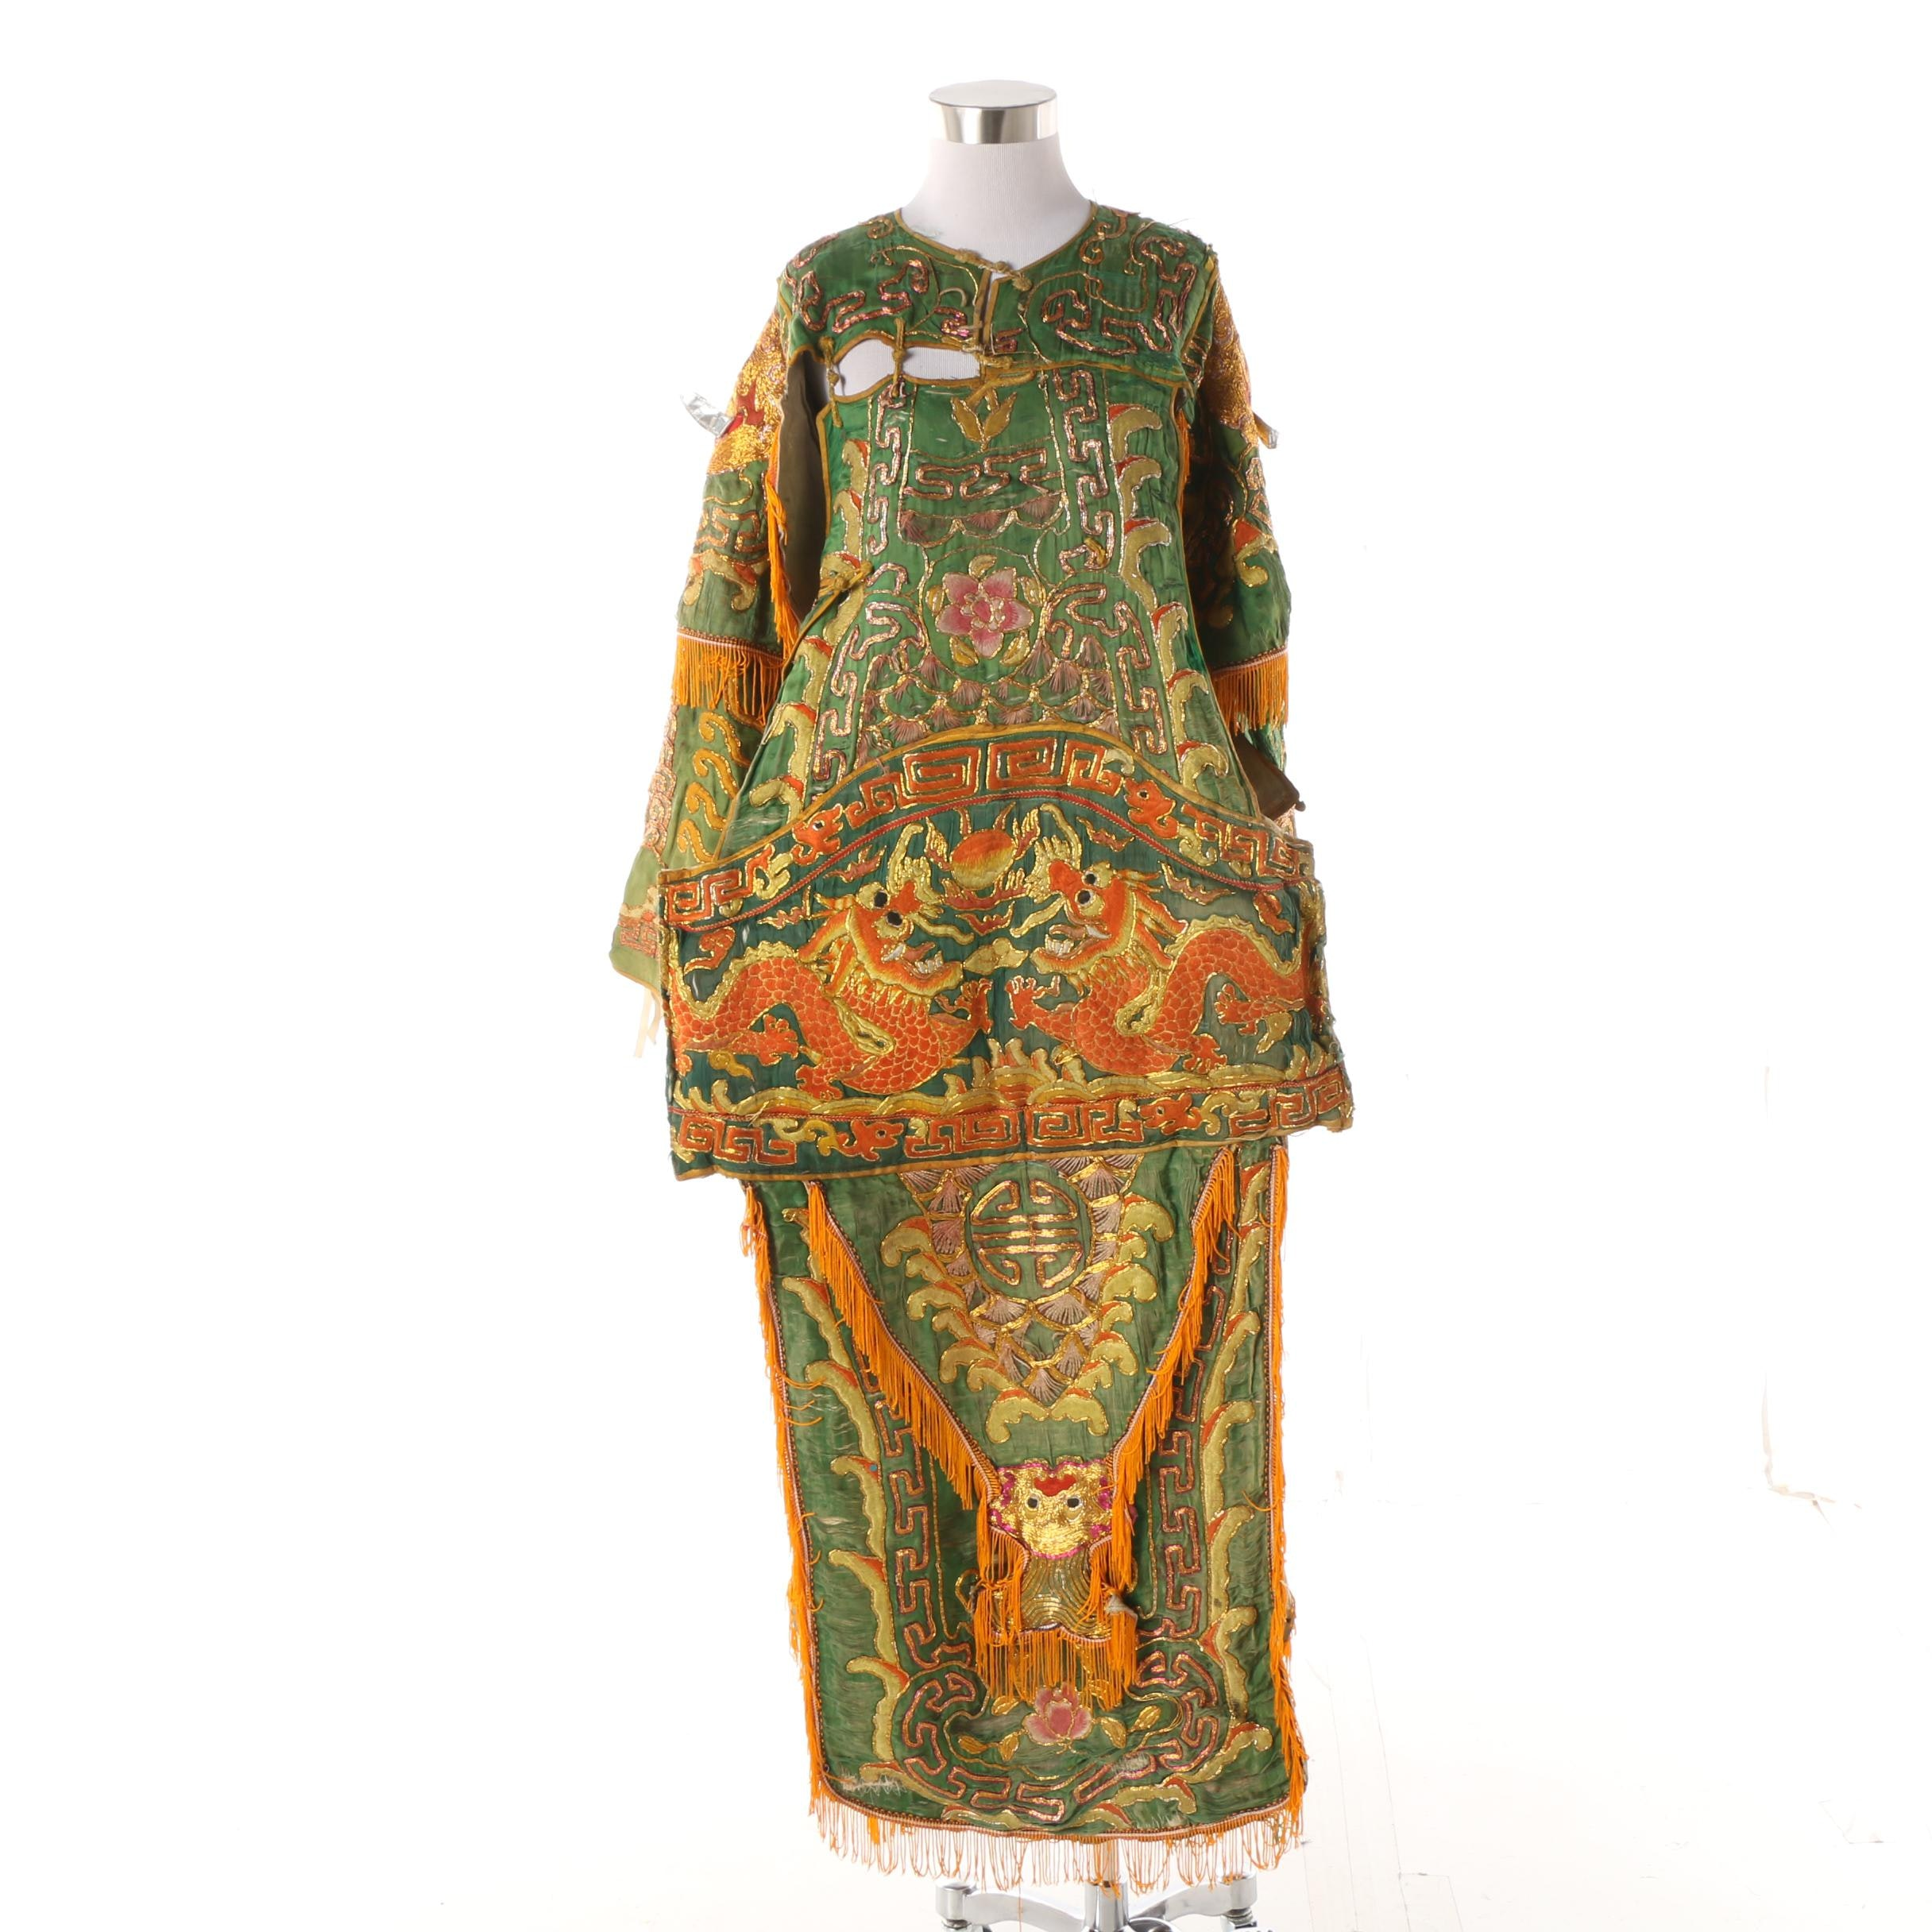 Chinese Peking Opera Embroidered Theatrical Warrior Costume